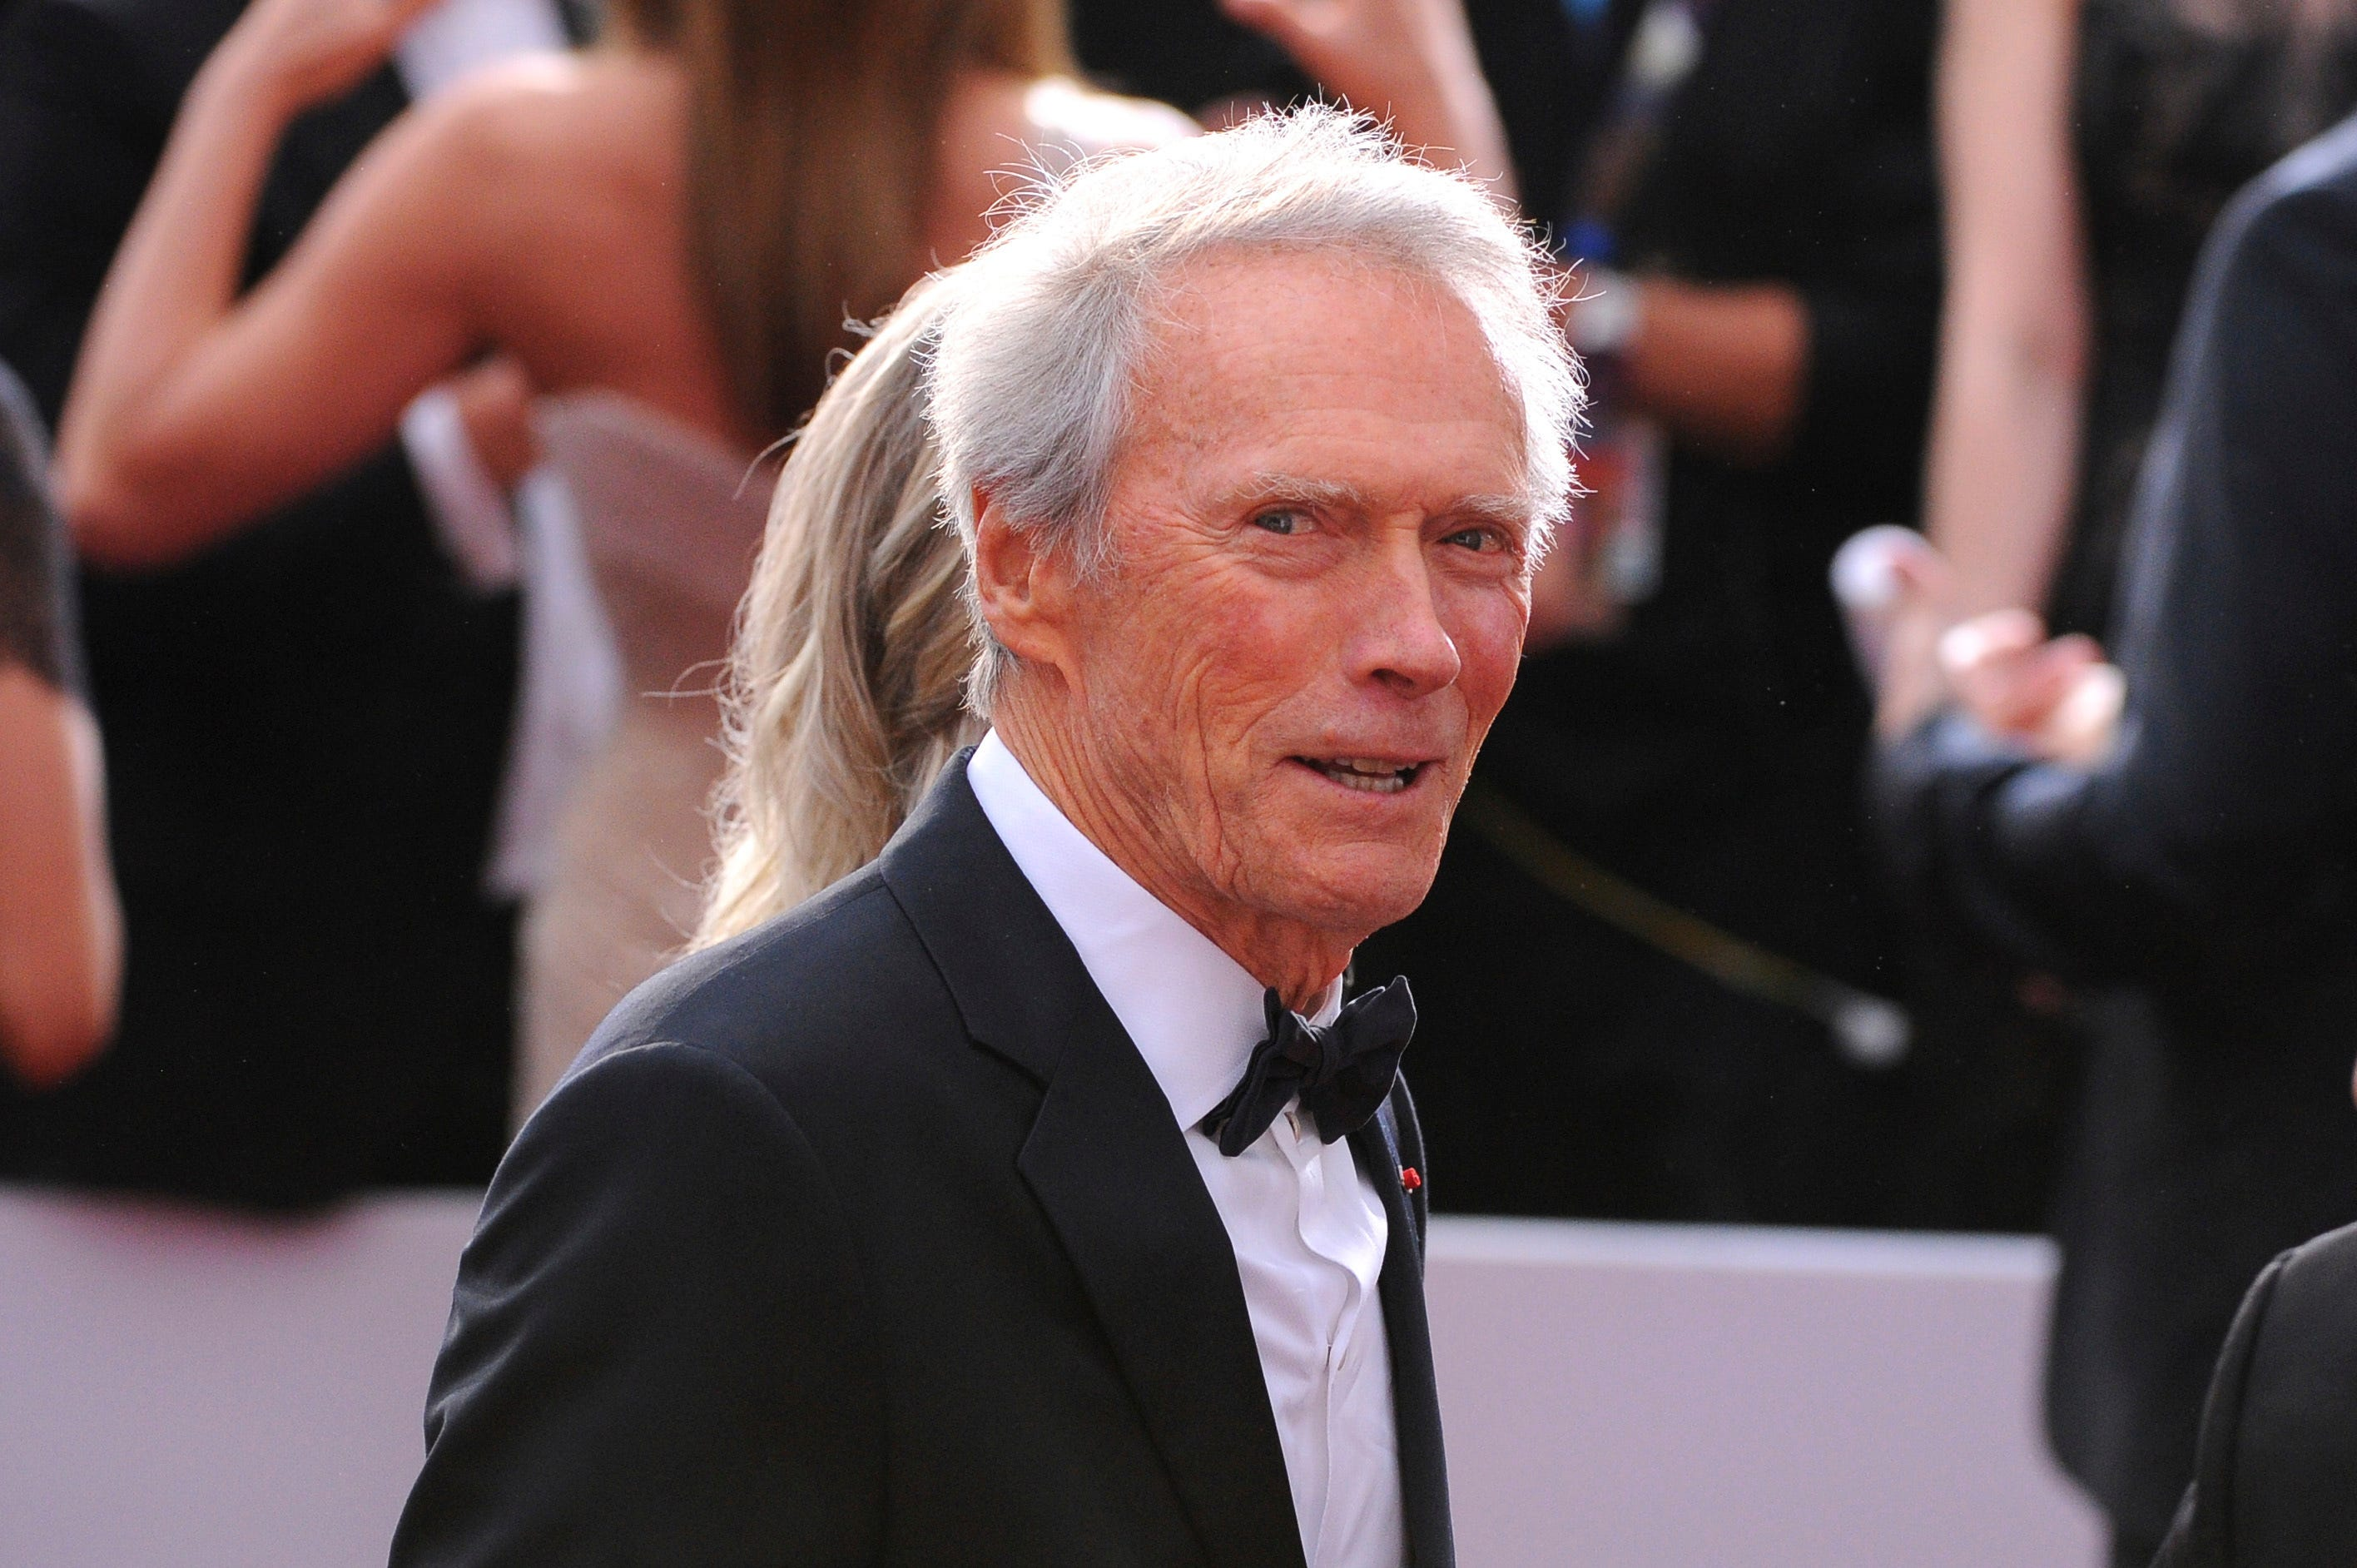 See Clint Eastwood Turn Drug Runner and Evade Bradley Cooper in The Mule' Trailer